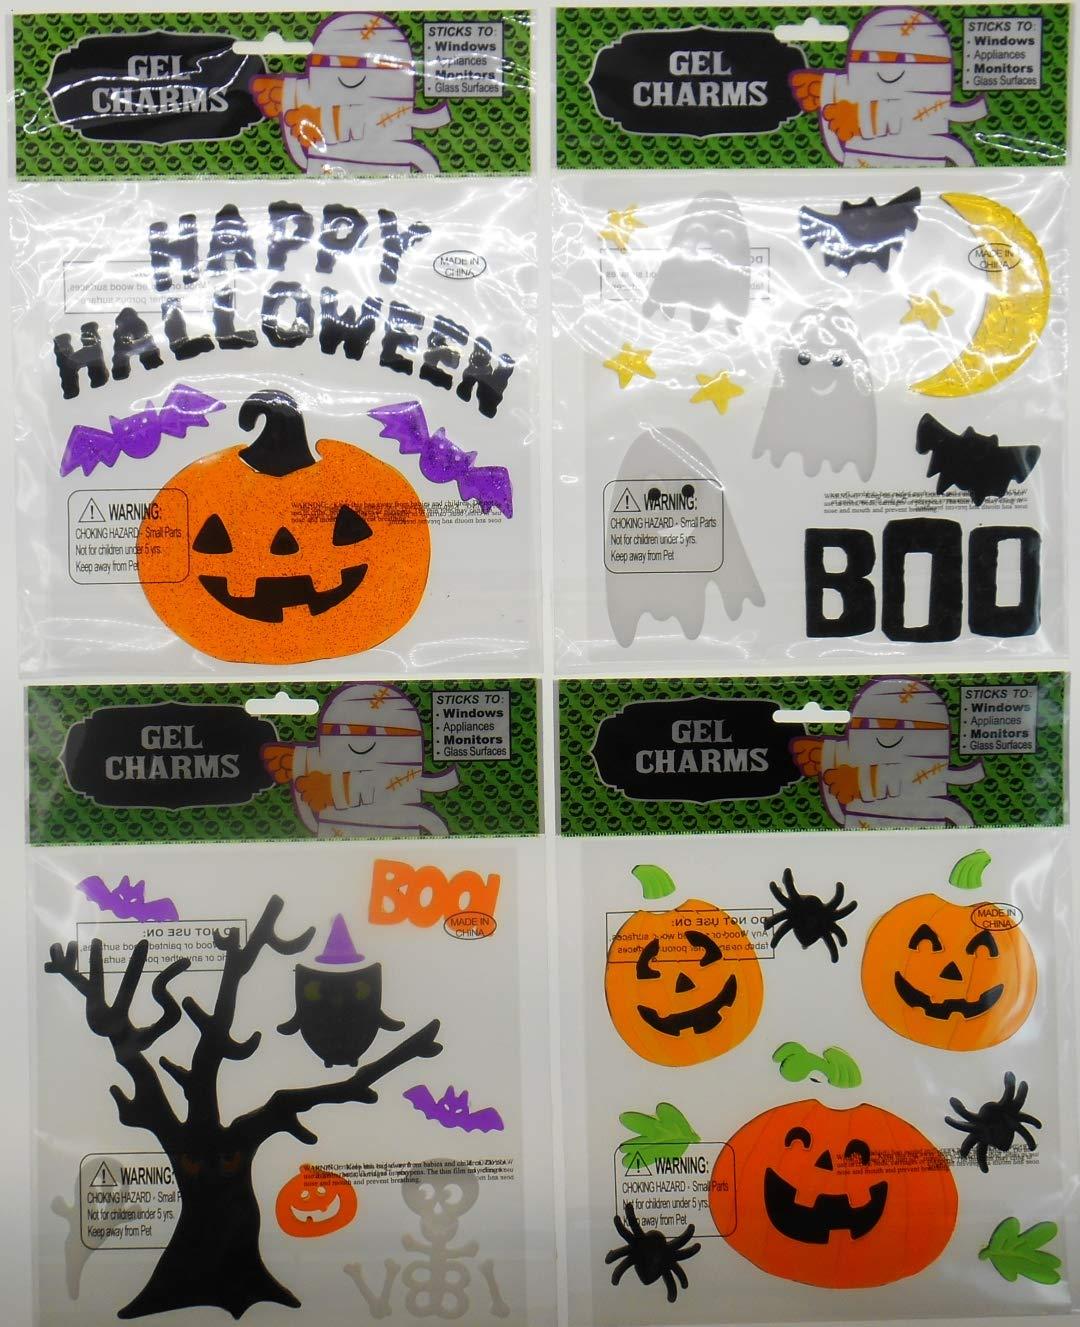 Spooky Halloween Decorations Window Gel Clings - Black Happy Halloween, Jack O Lanterns, Spiders, Bats, Skeleton, Owl, Tree and Ghosts wit Boo - Bundle of 4